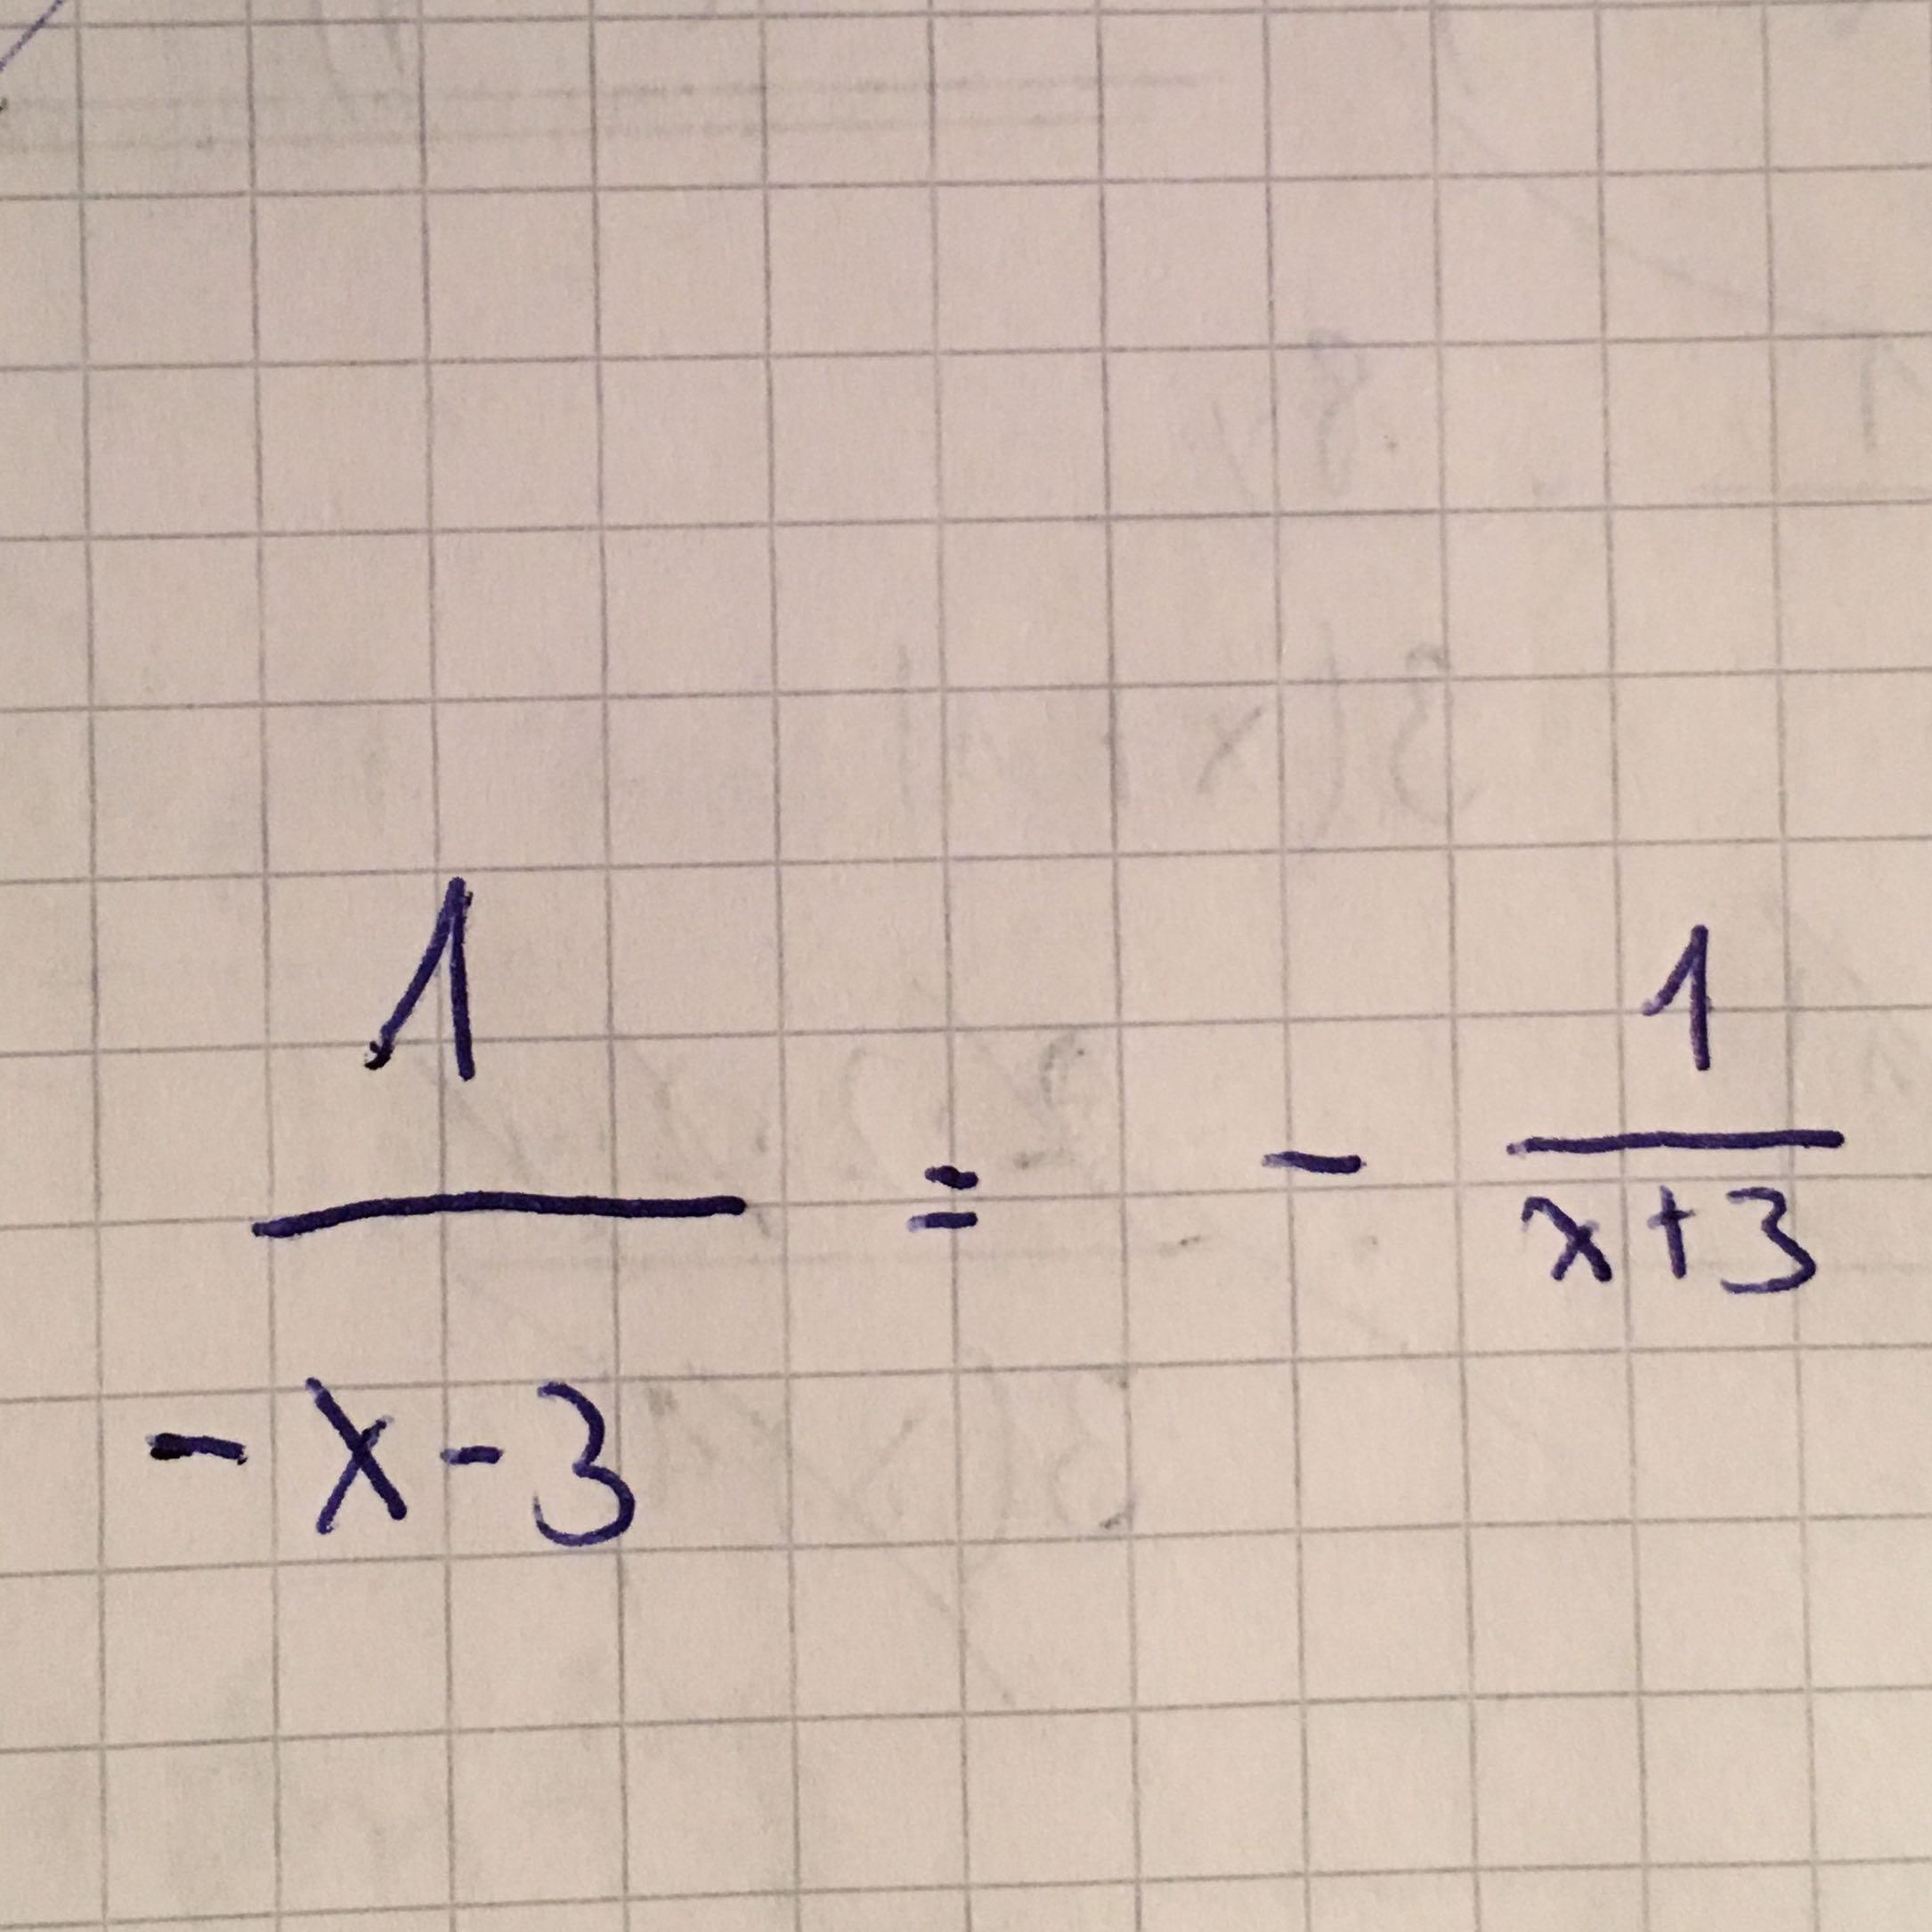 ist 1/-x-3 = - 1/x+3 das genau gleiche? (mathematik, bruch, terme)